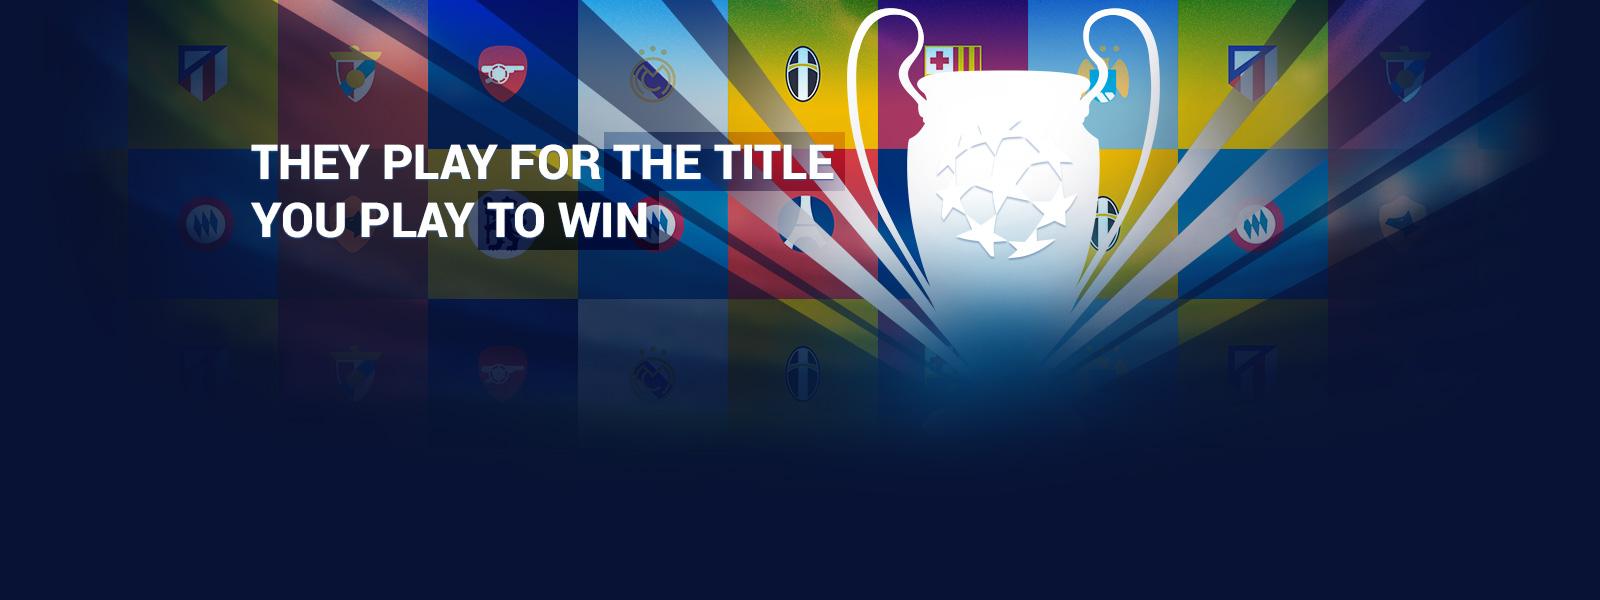 Get €5 Cashback on Champions League Correct Score Bets